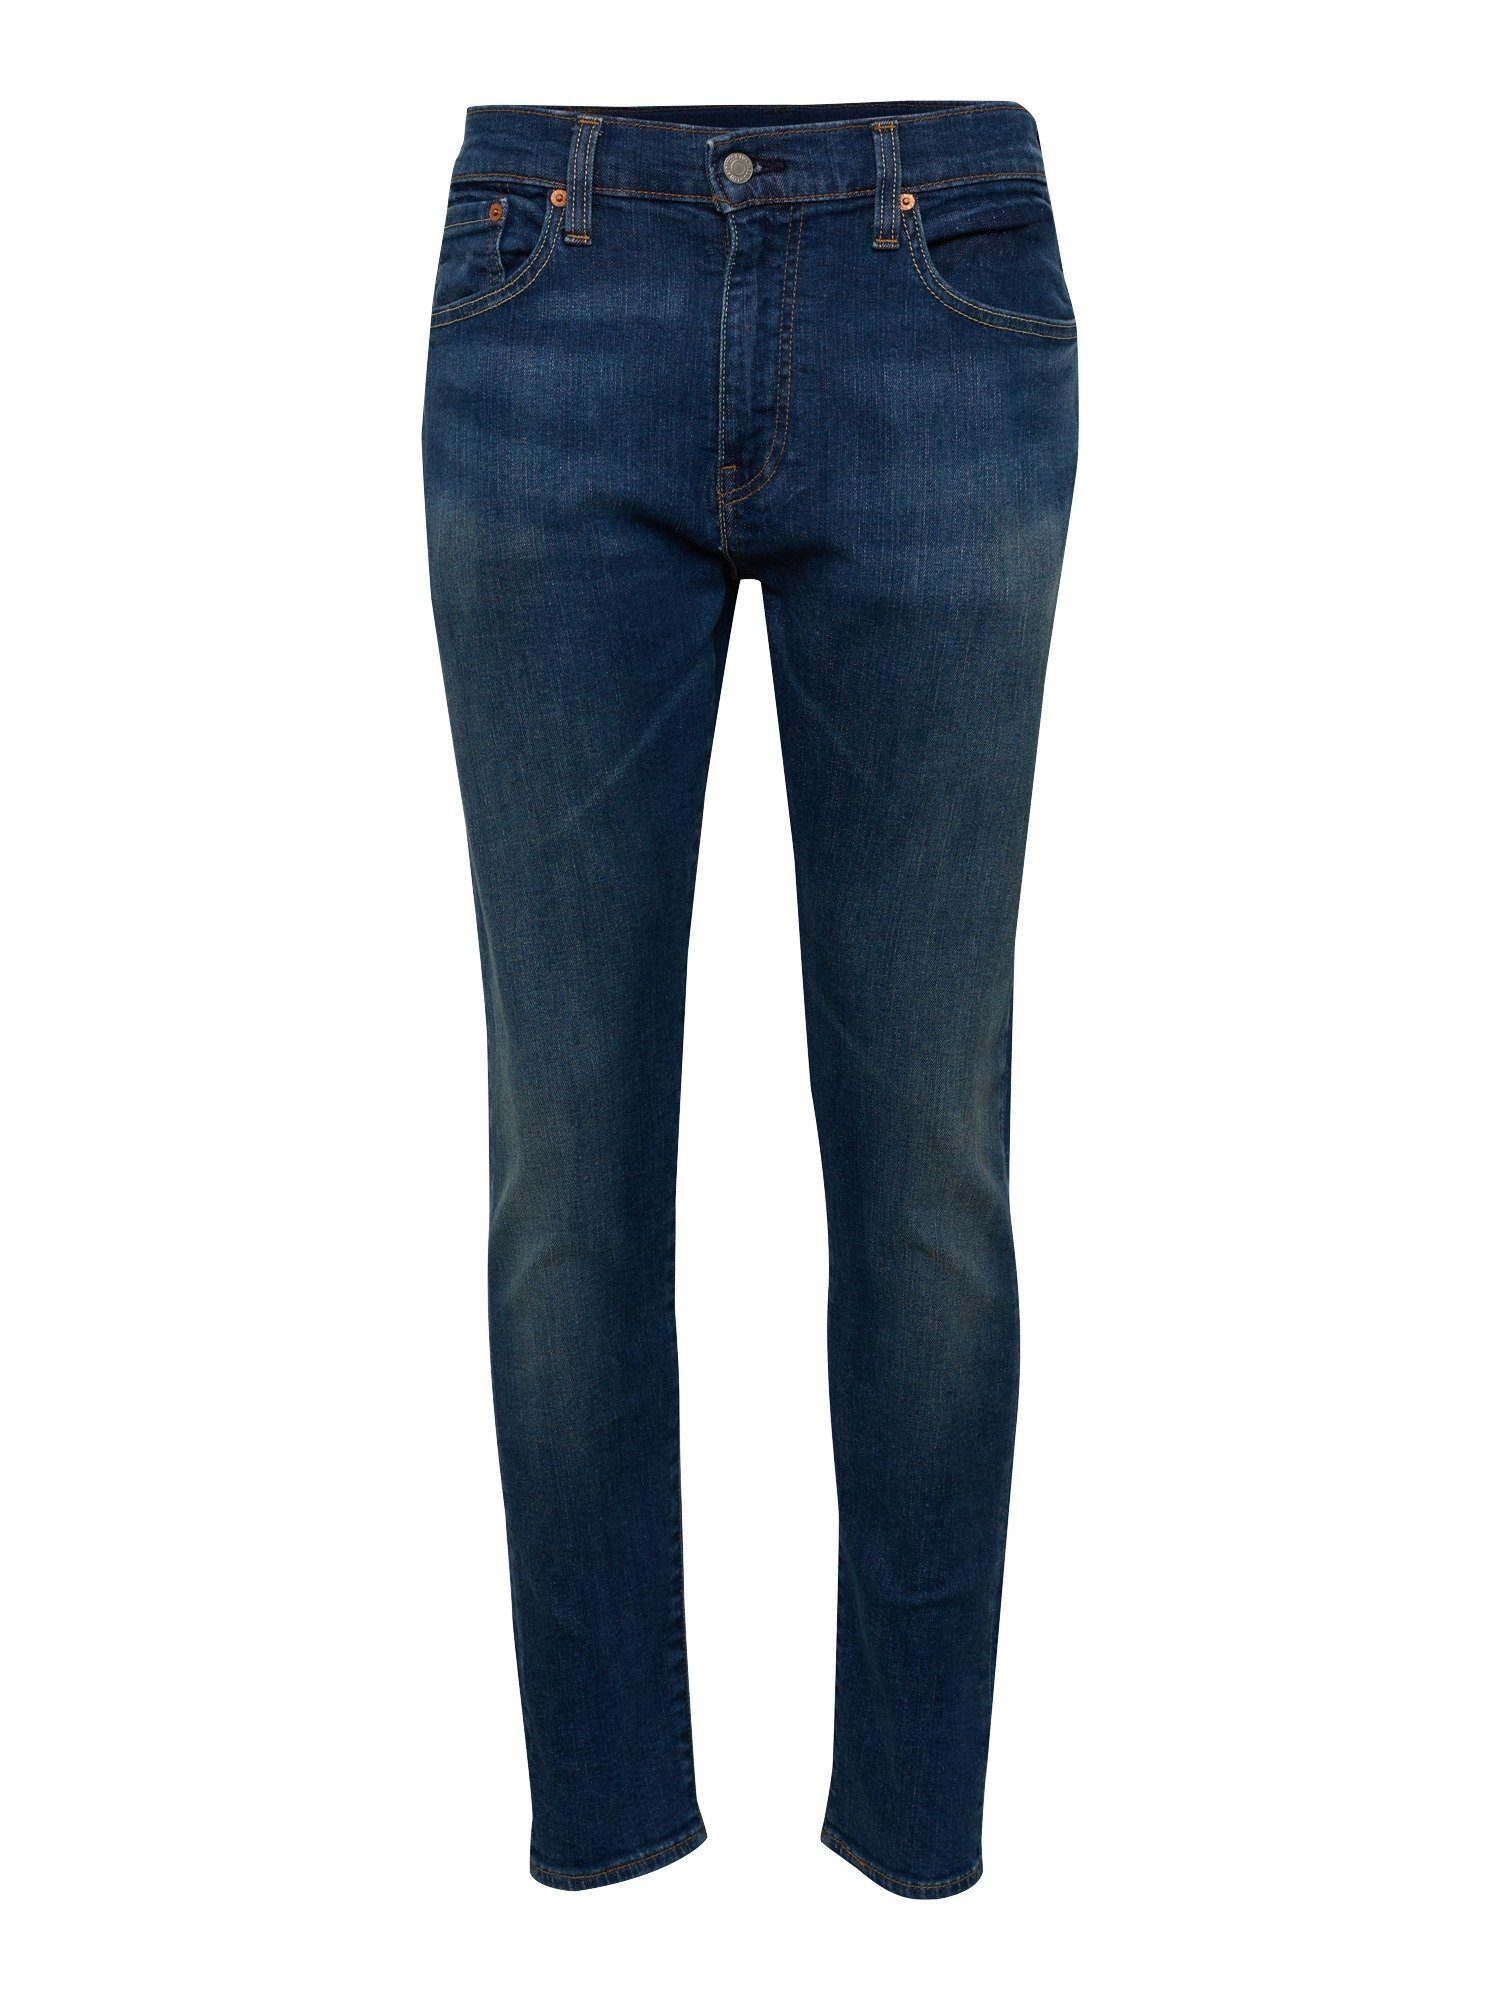 Levi's® Slim fit Jeans »512™«, Slim Fit online kaufen | OTTO